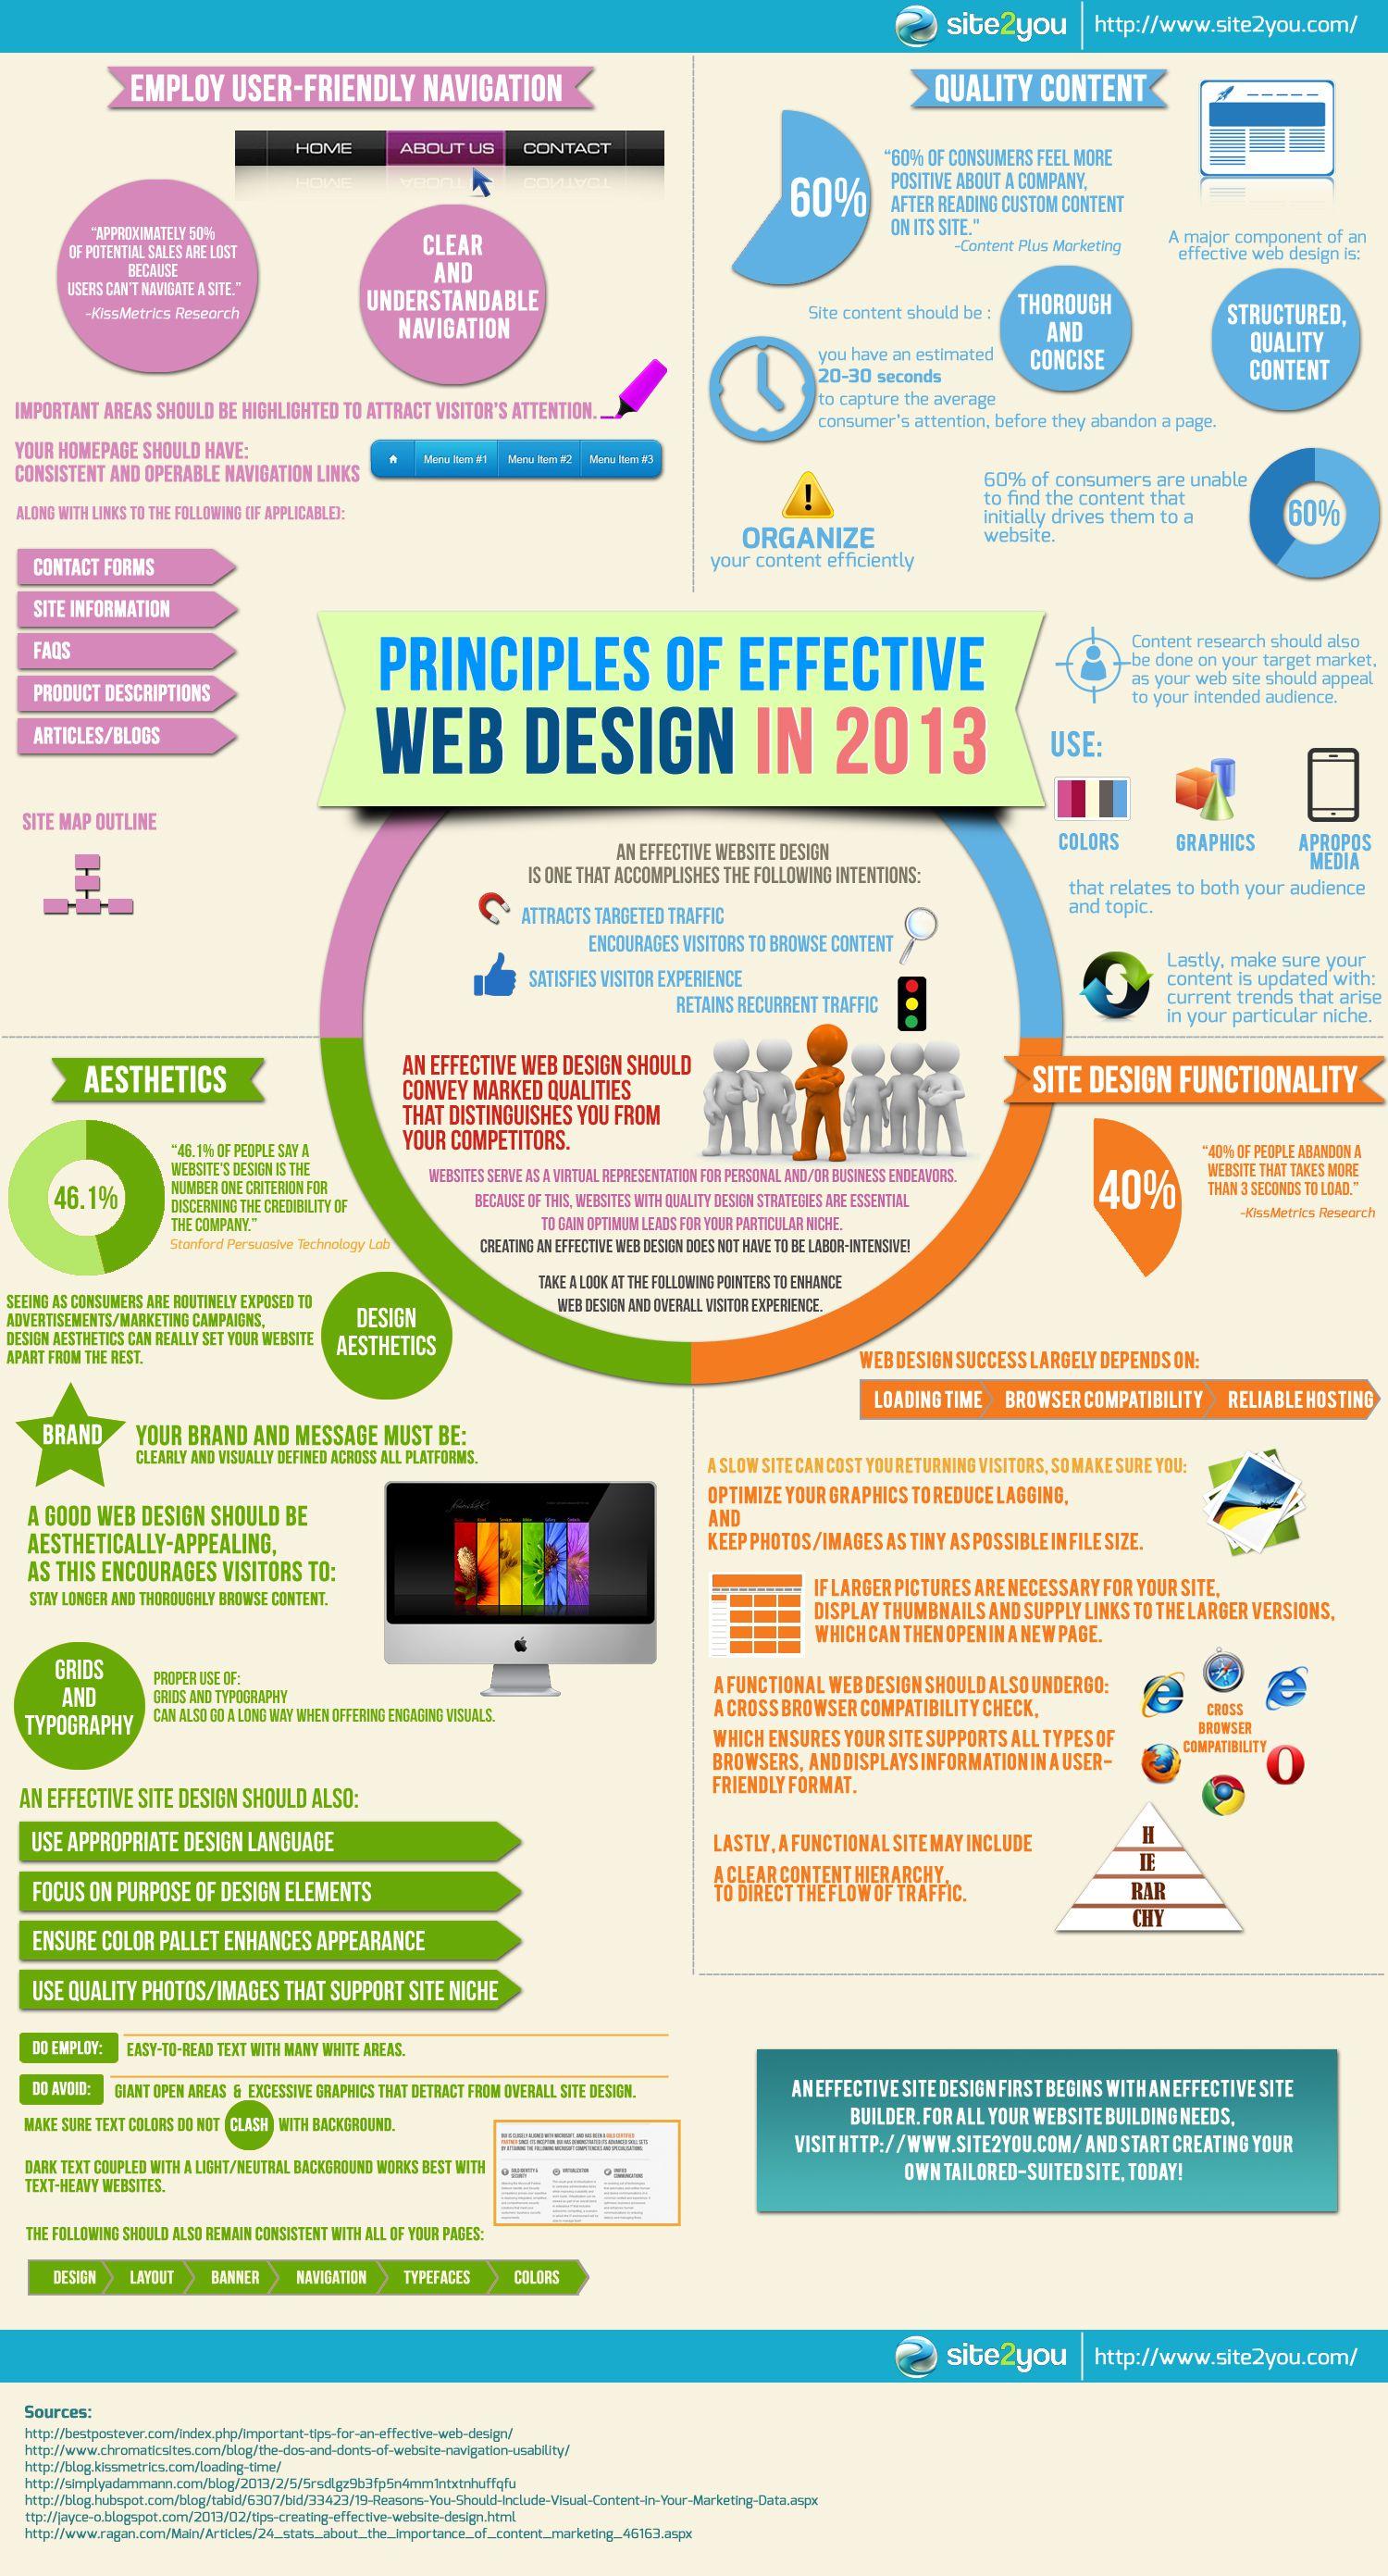 Infographics Ui Design Et Web Design: ITips: Web SITE DESIGN PRINCIPLES